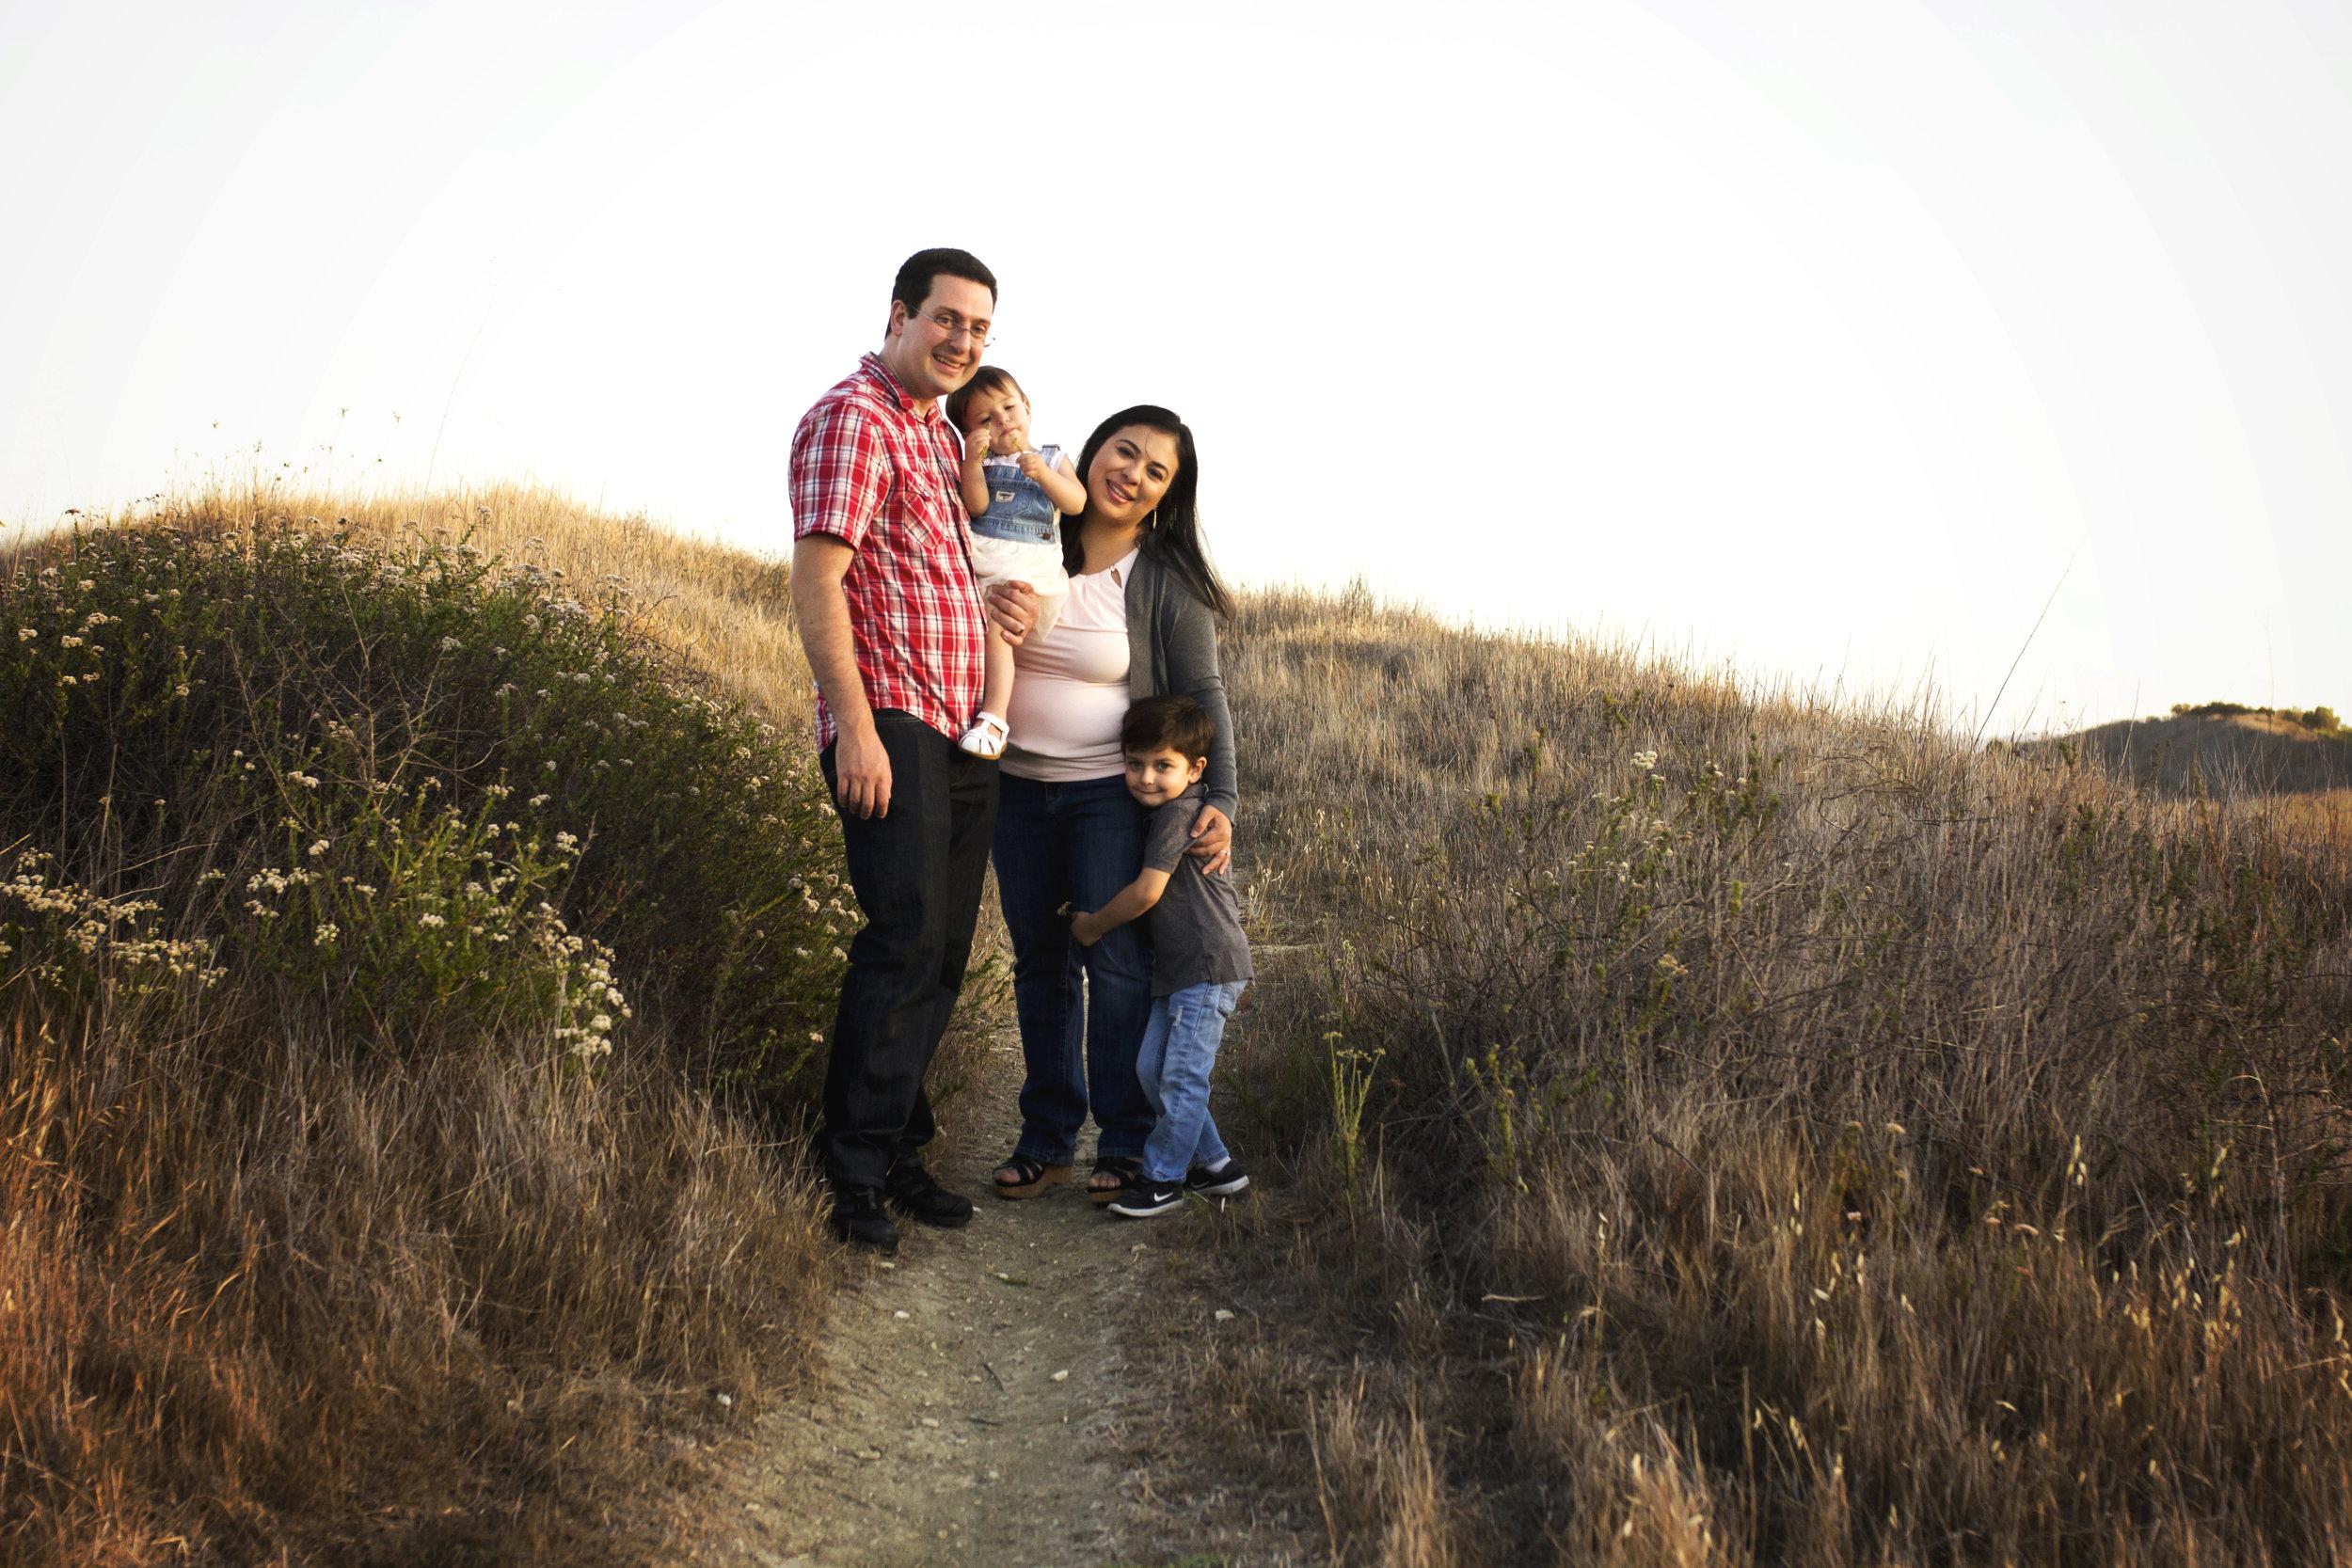 Orange County Family Photographer | Mission Viejo Photography